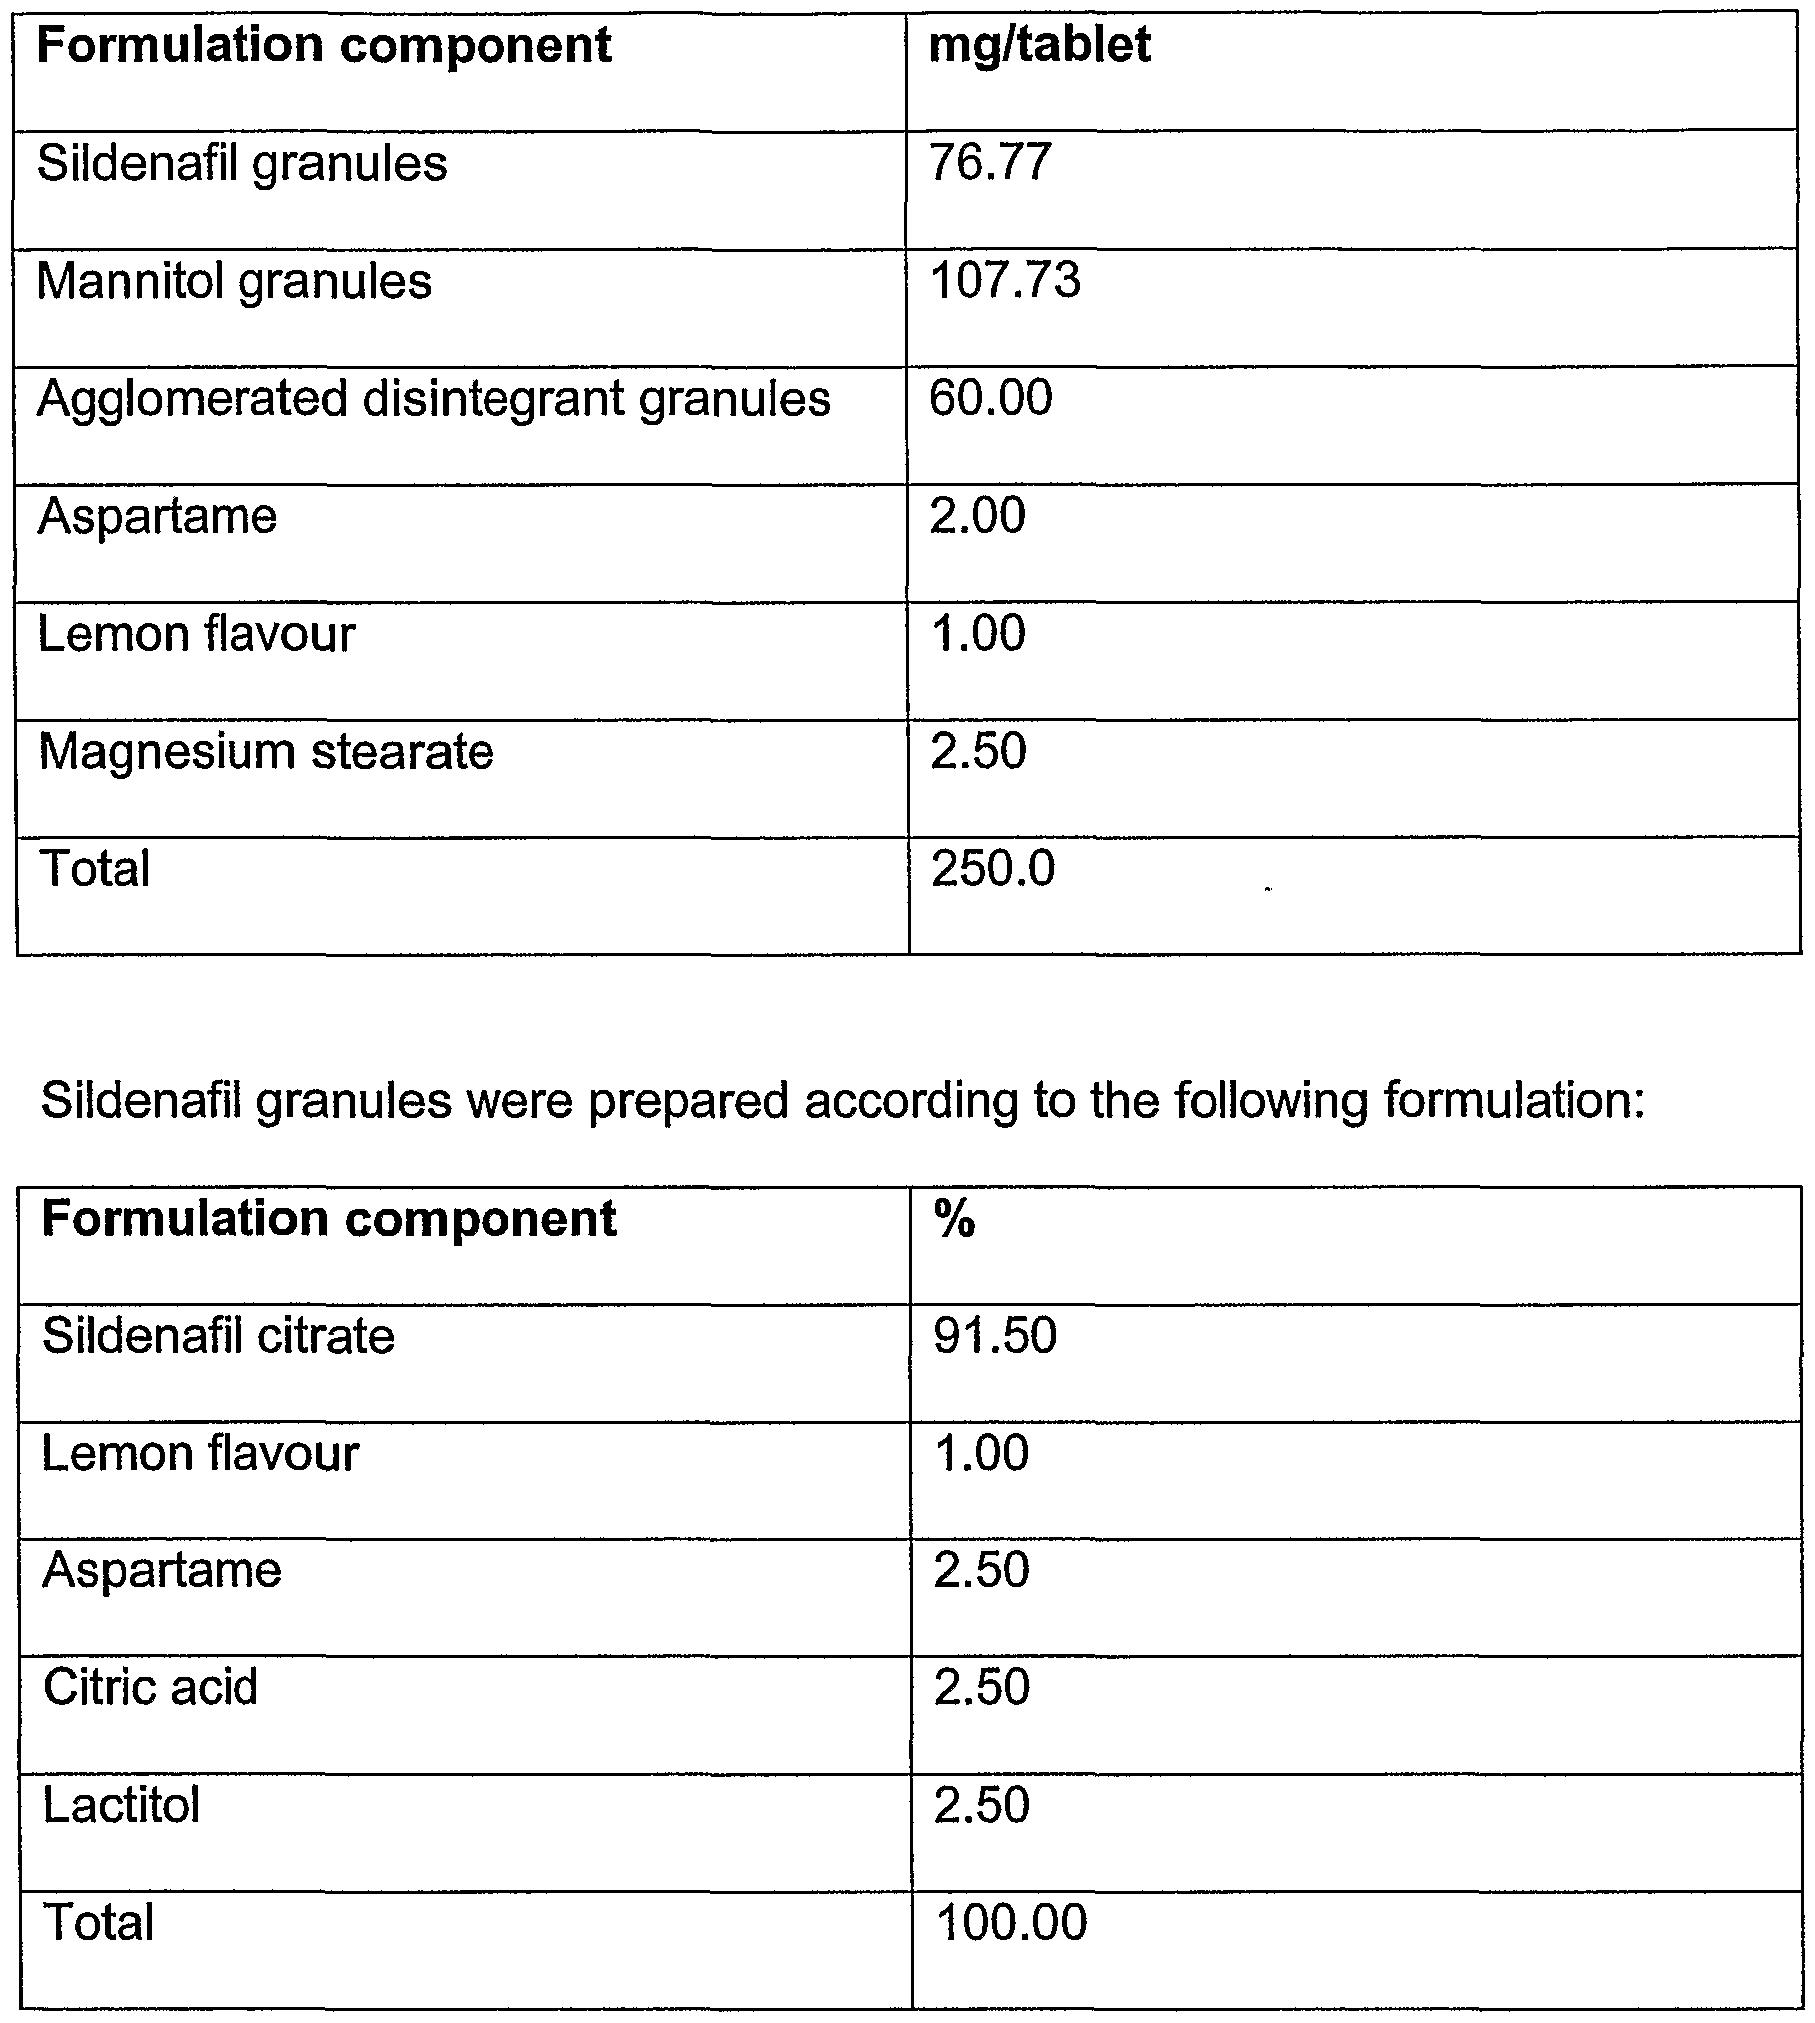 Sildenafil Dosage Forms